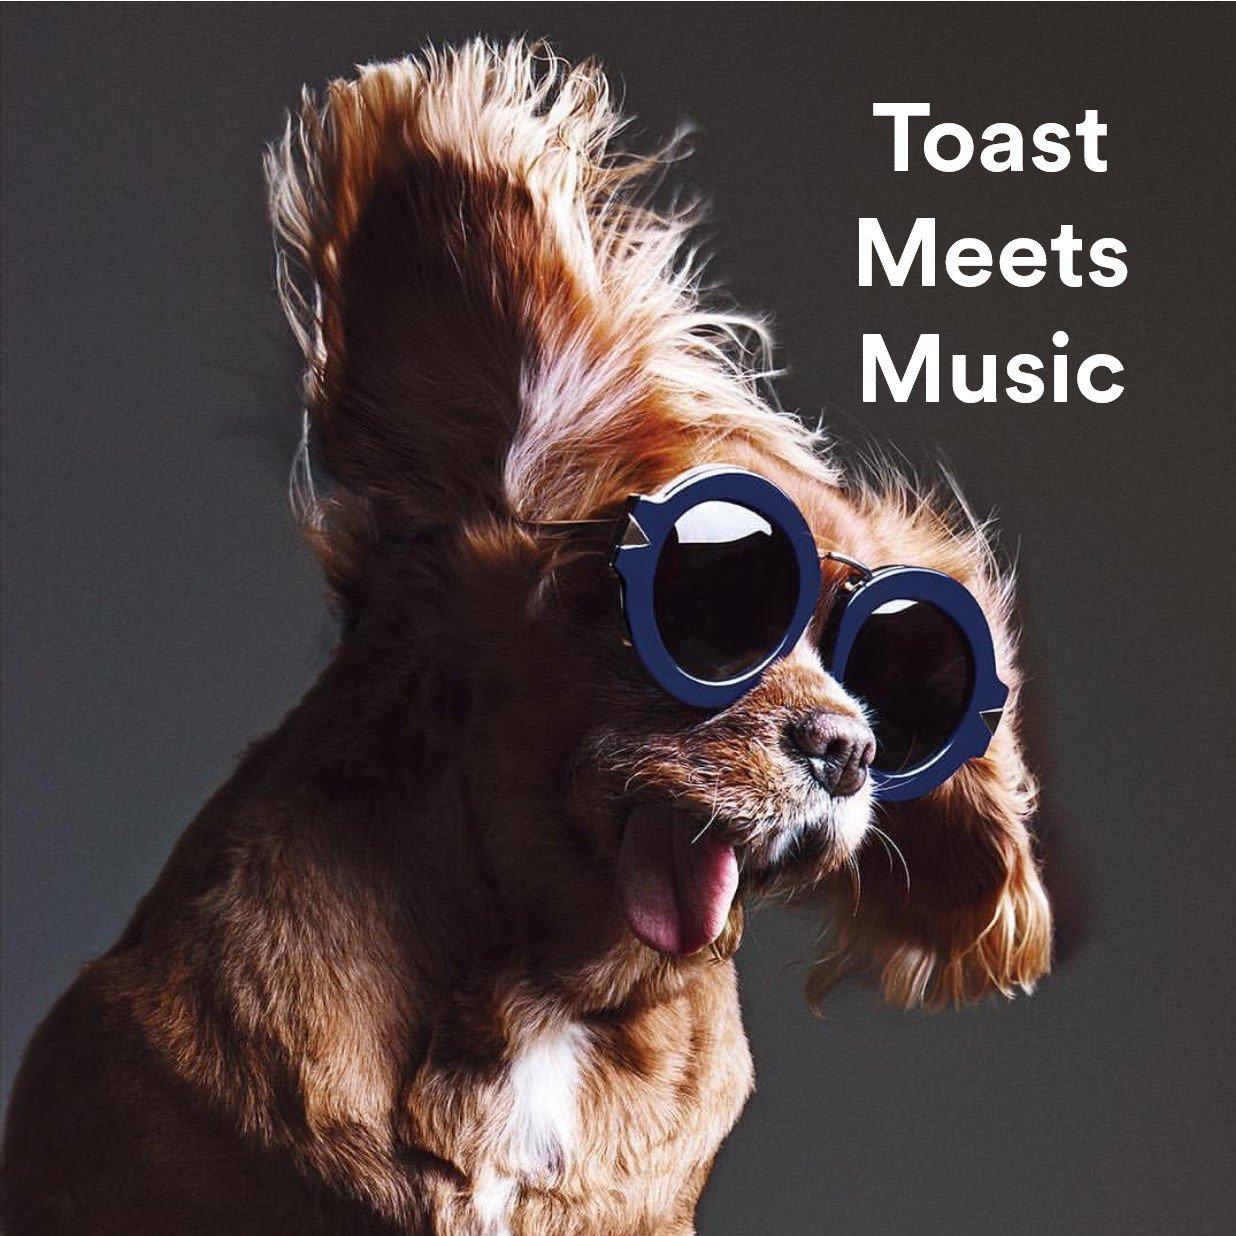 7. #ToastMeetsWorld - Toast Meets Music https://t.co/ZBbNC3WUH7 https://t.co/heX0eFXDXC